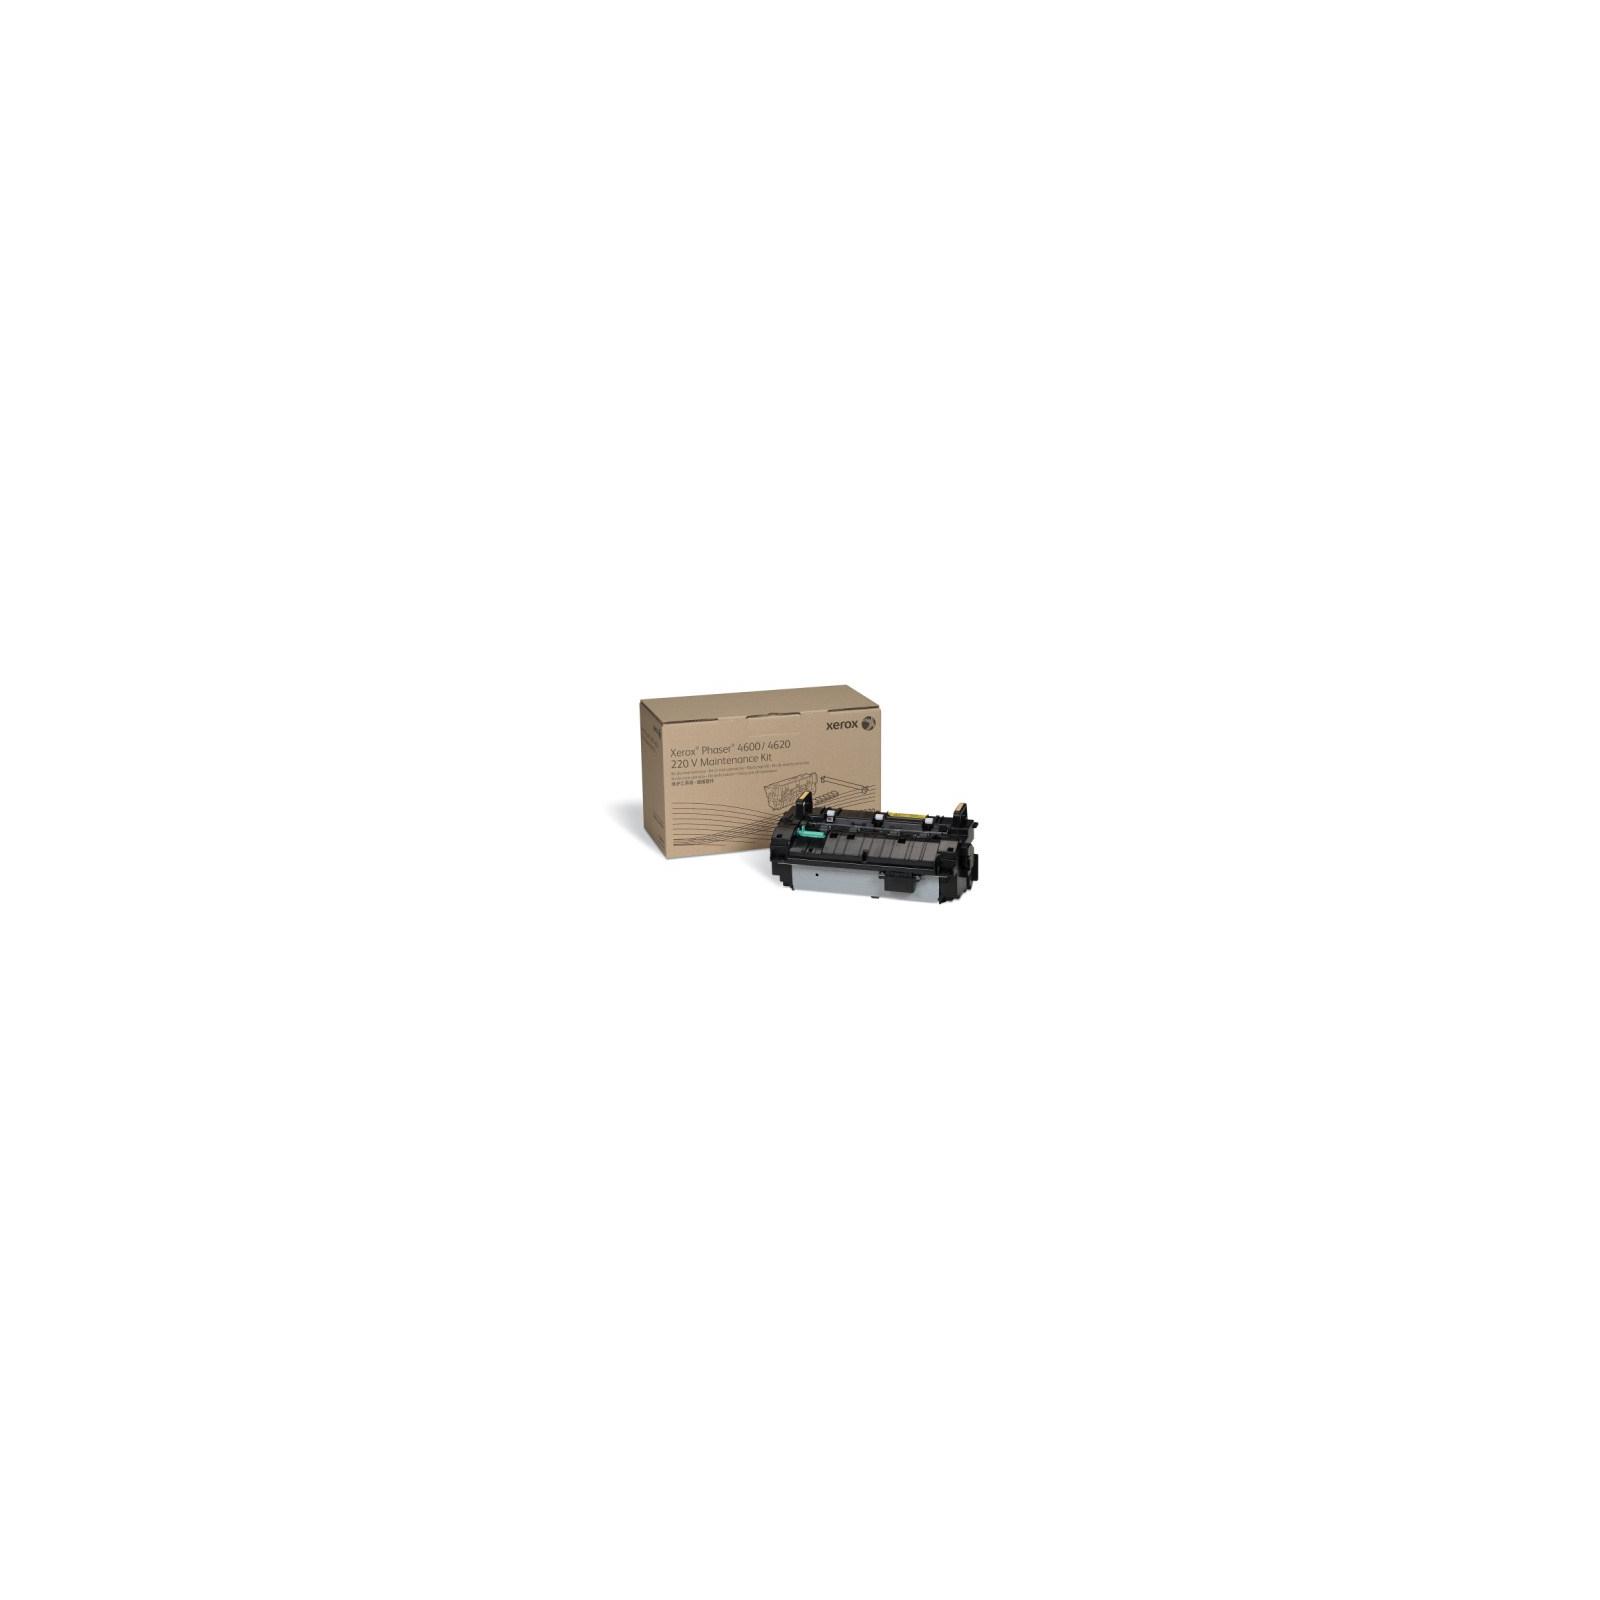 Фьюзер XEROX Phaser 4600/4620 (115R00070)